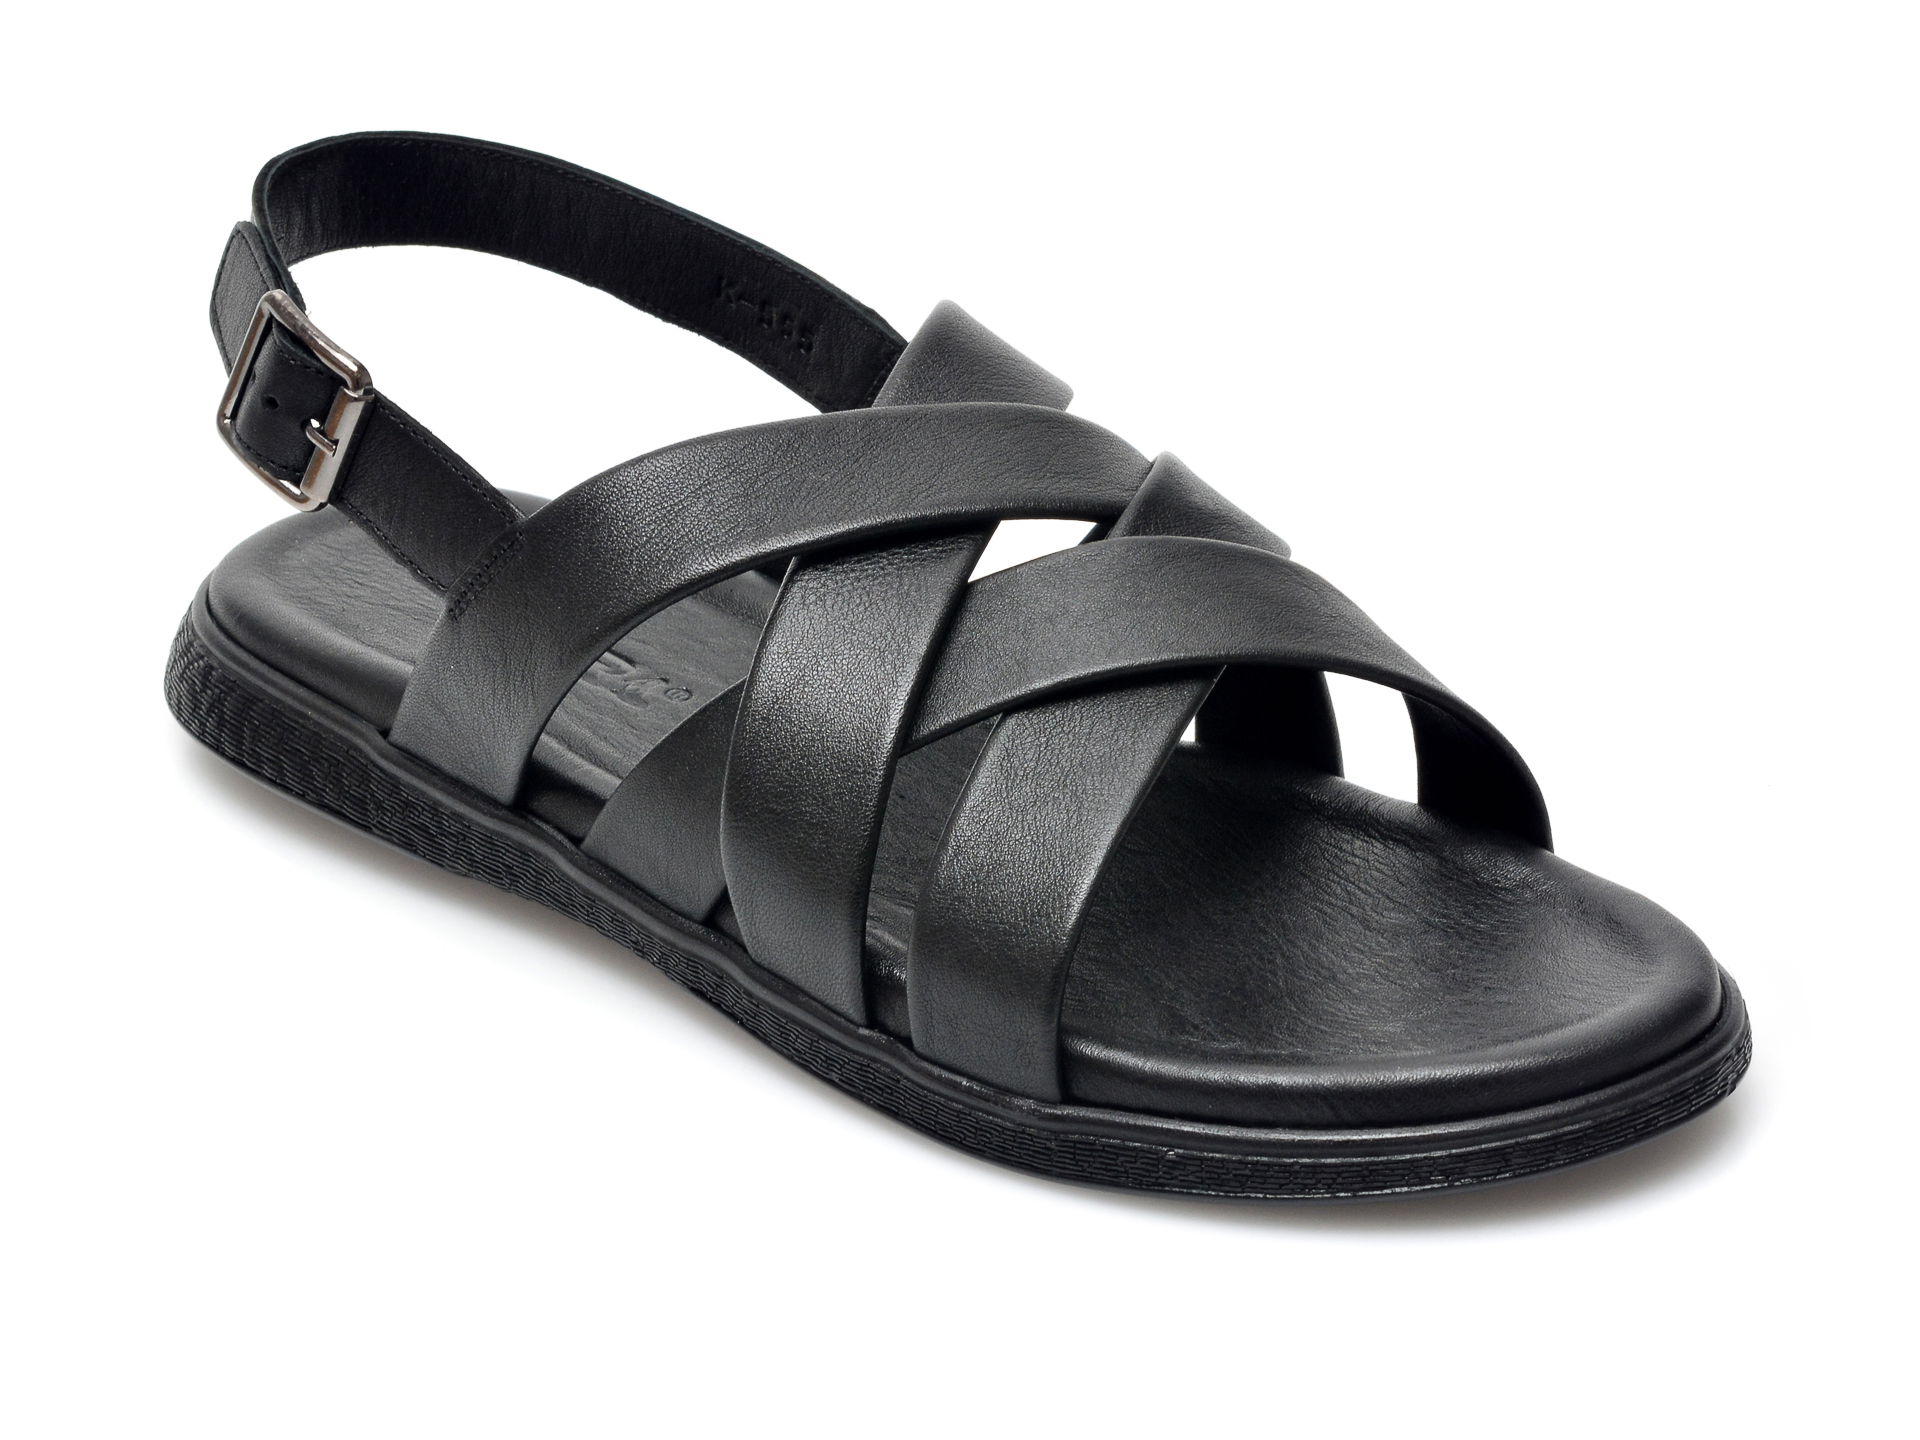 Sandale OTTER negre, 555, din piele naturala imagine